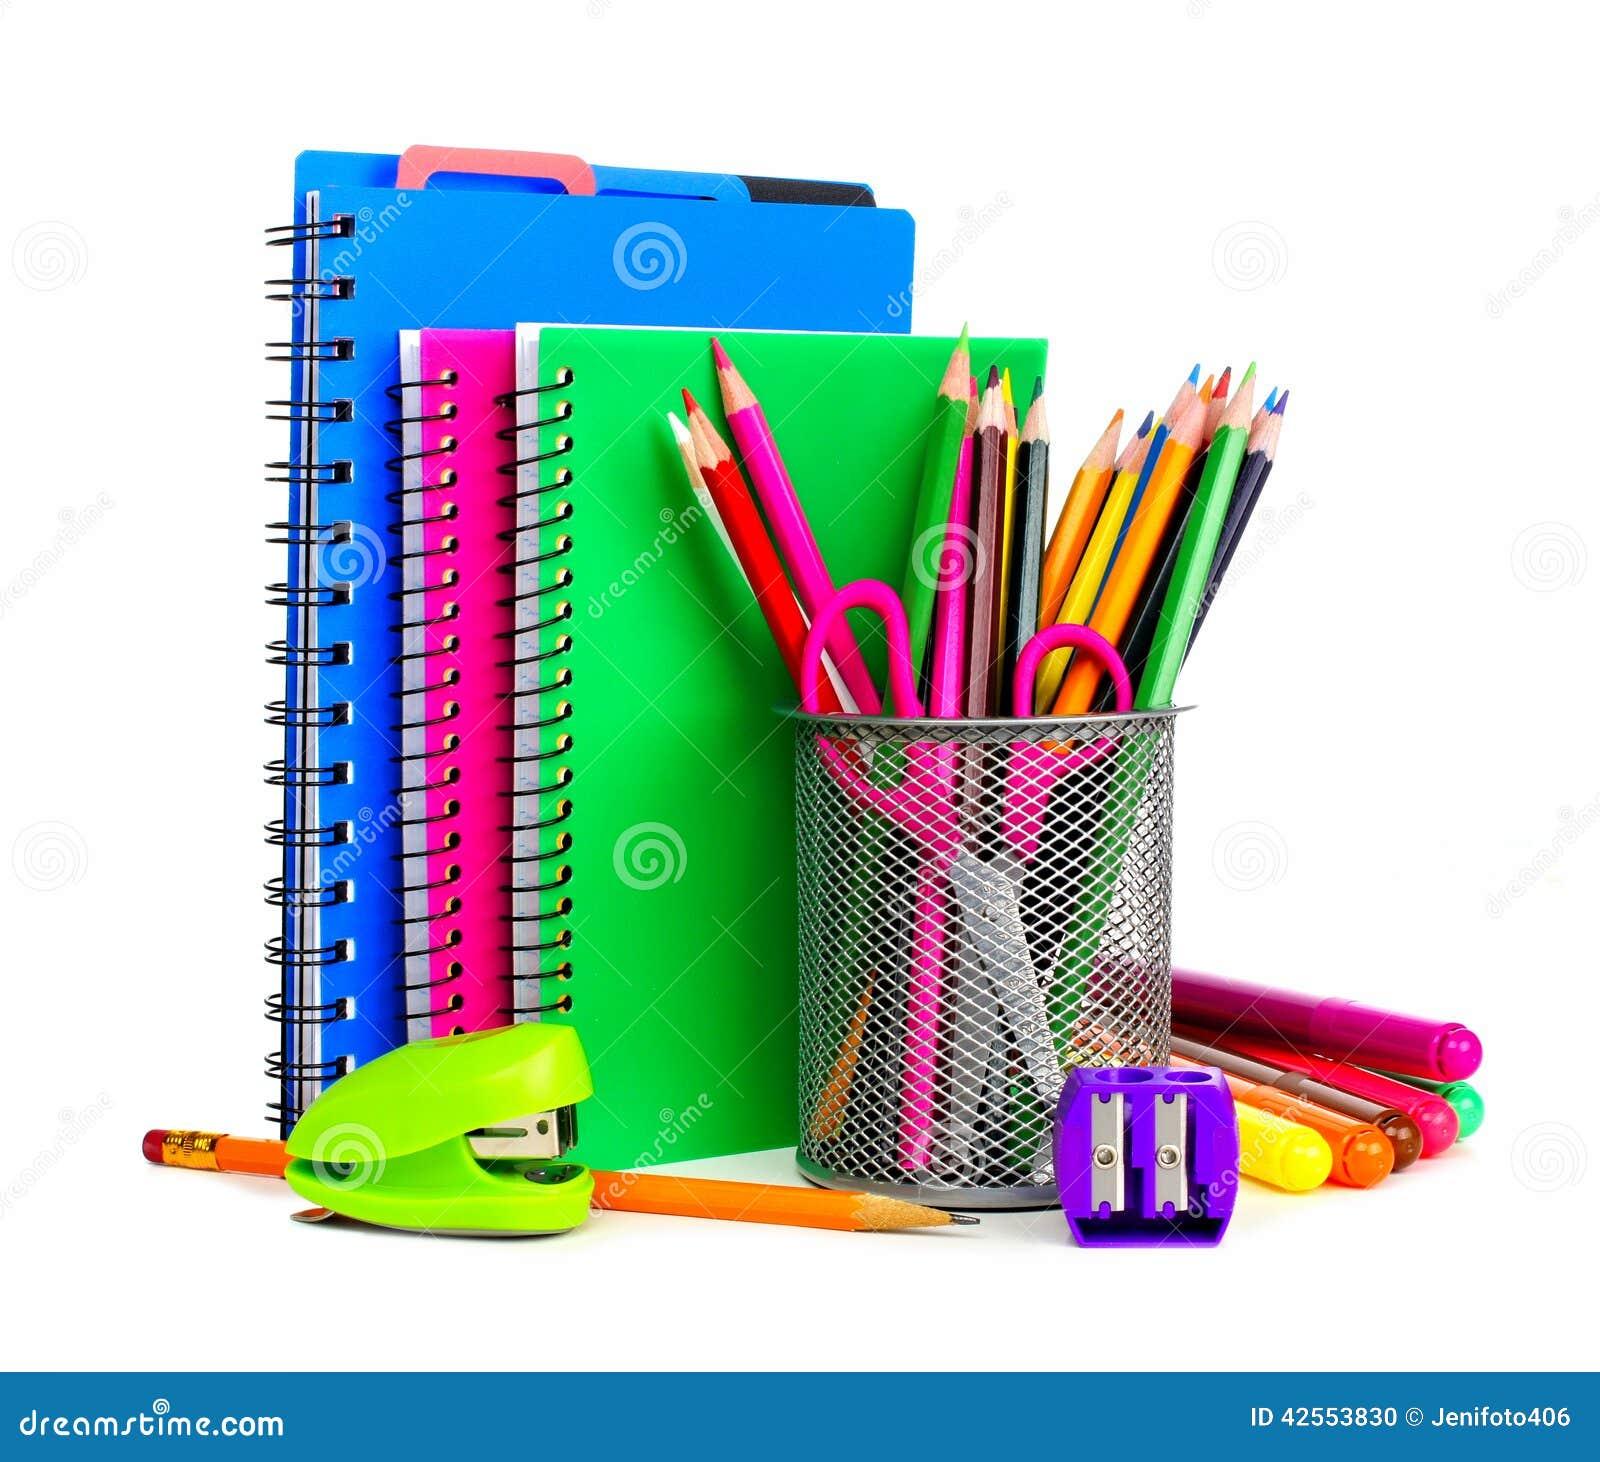 Carnets et fournitures scolaires